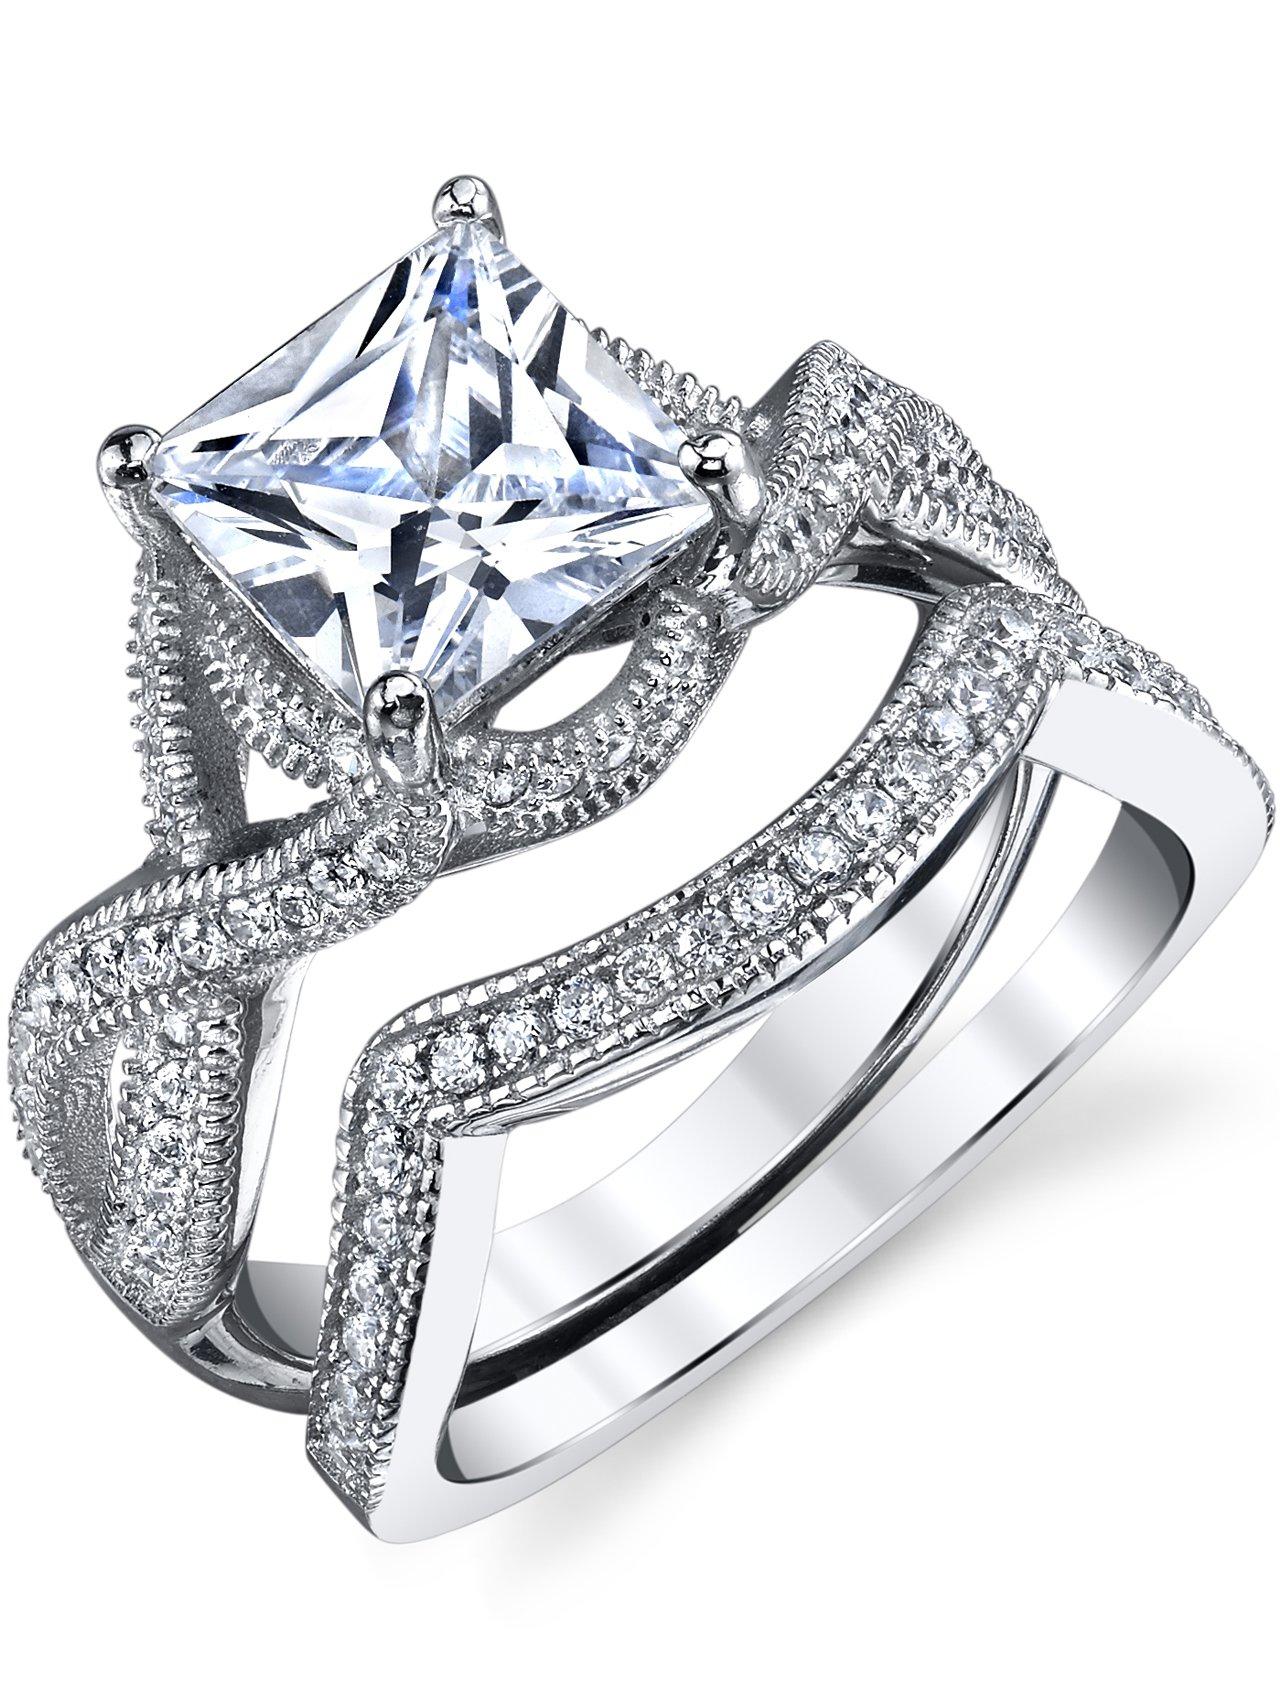 3 Carat Princess Cut Sterling Silver and Cubic Zirconia Wedding Ring Engagment Band, Bridal Set SZ 7